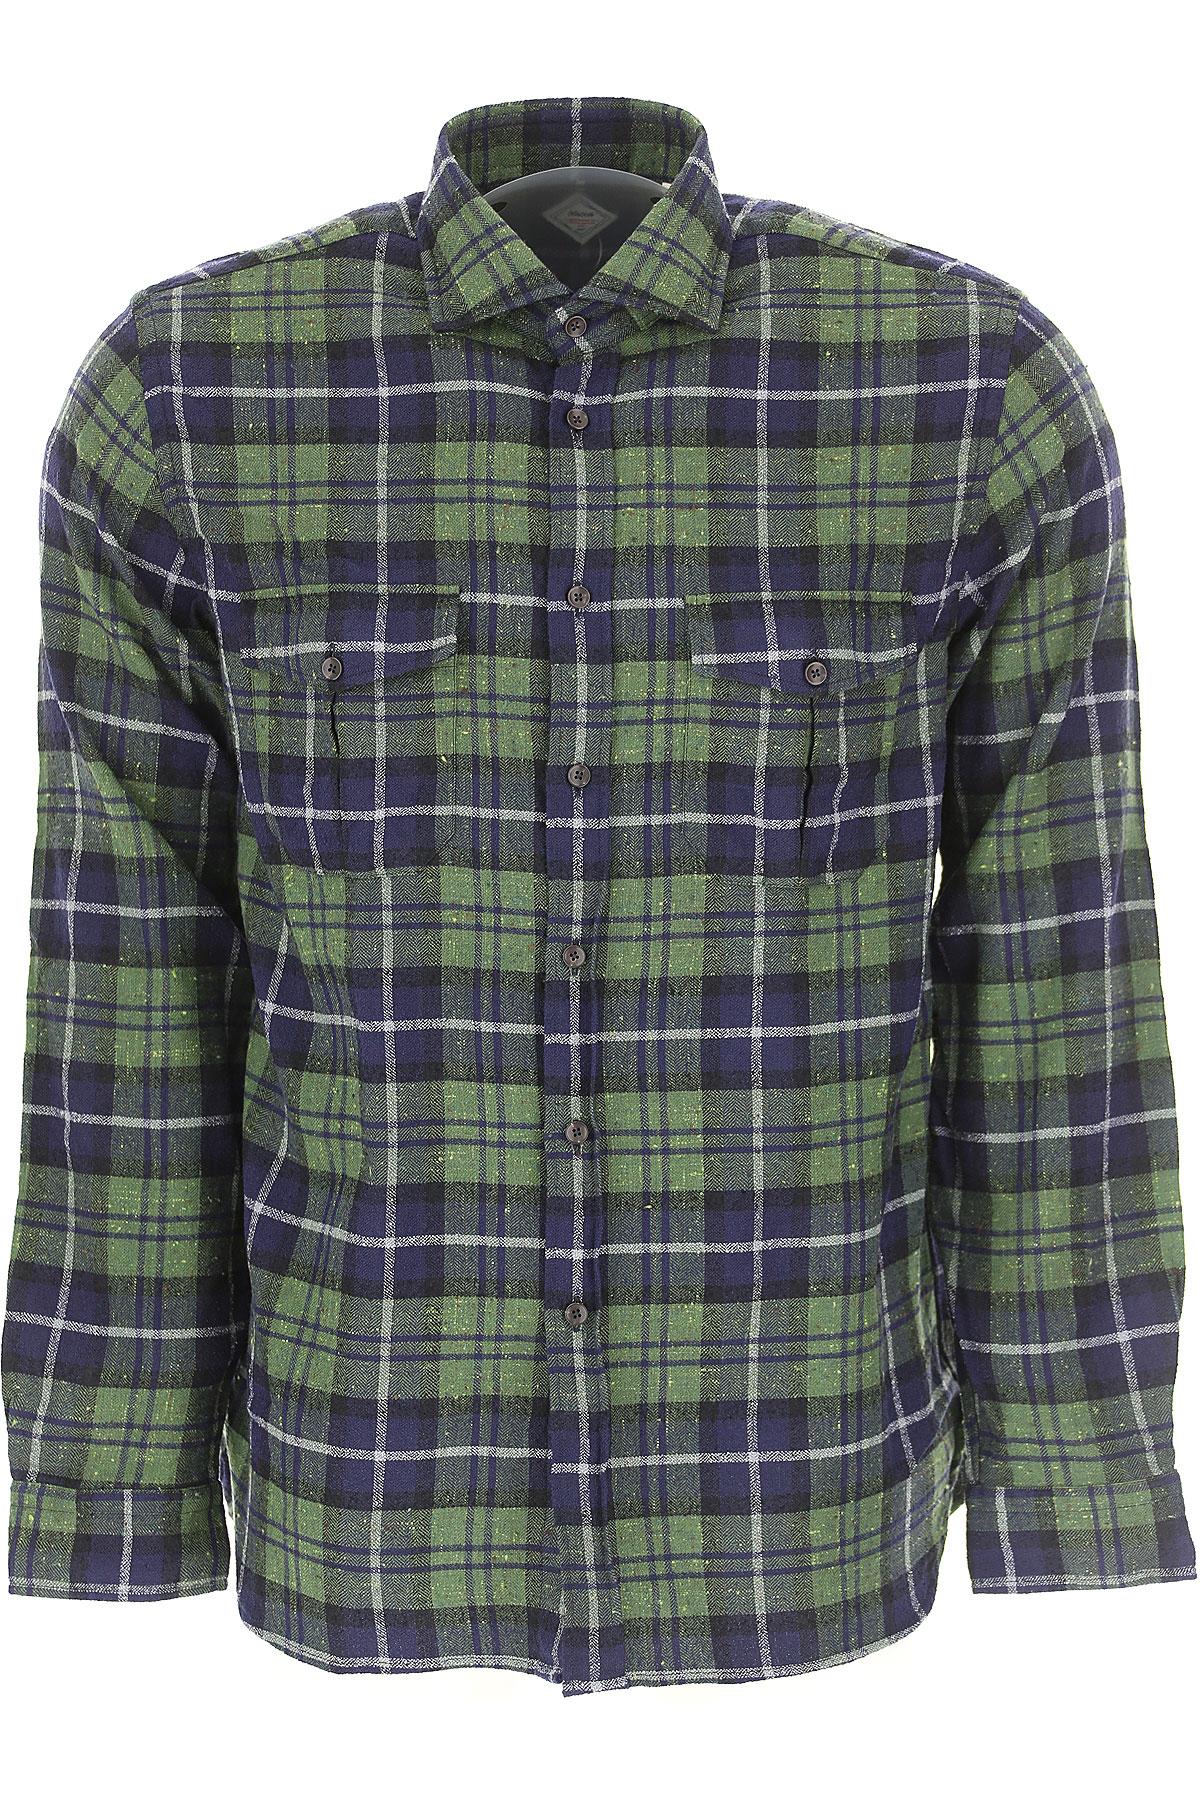 Image of Xacus Shirt for Men, Green, Cotton, 2017, L M S XL XXL